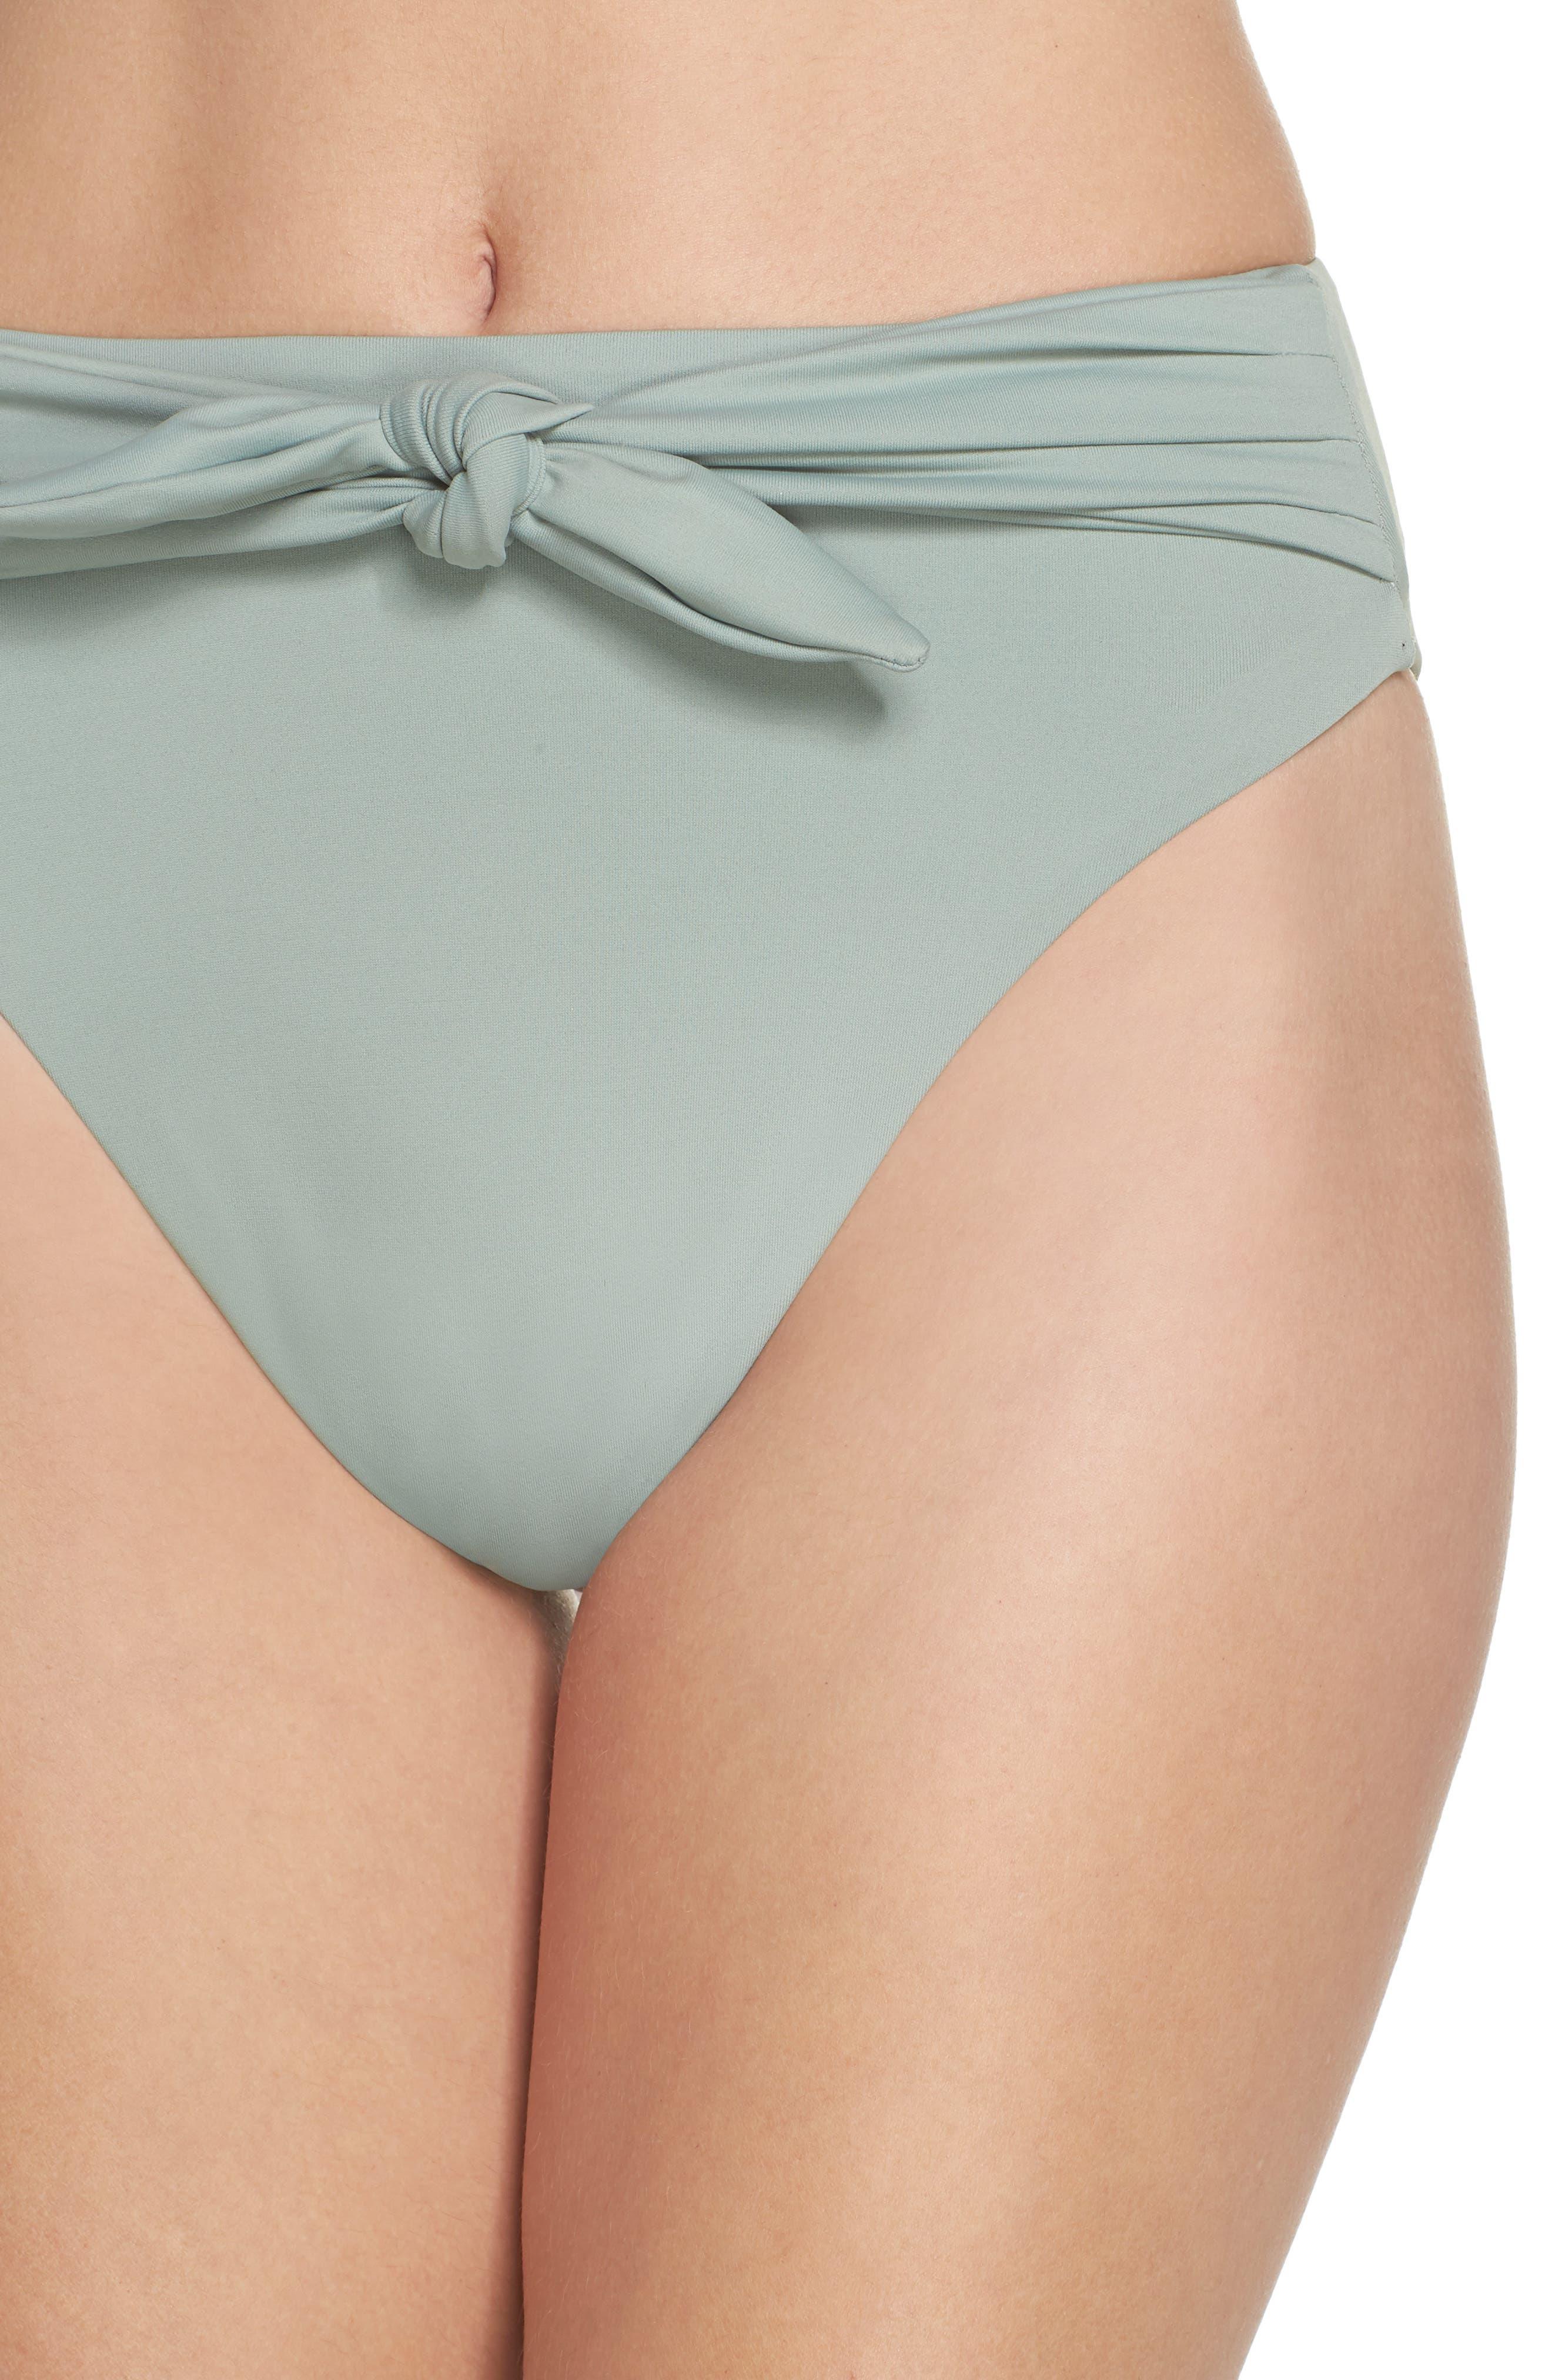 Paula Tie-Up Bikini Bottoms,                             Alternate thumbnail 4, color,                             PISTACHE GREEN